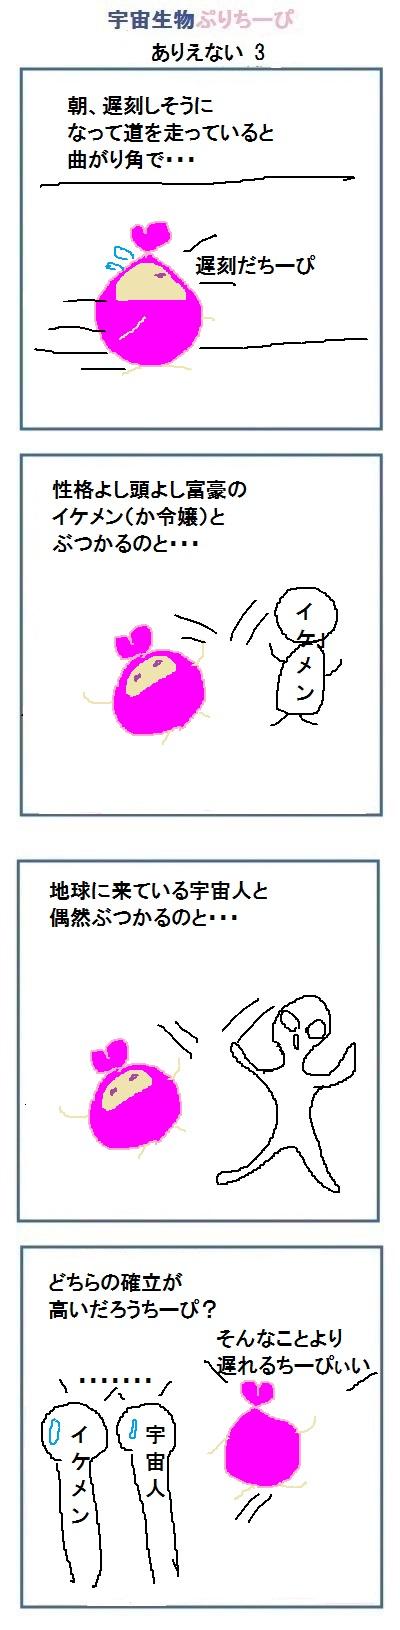 160528_arienai3.jpg